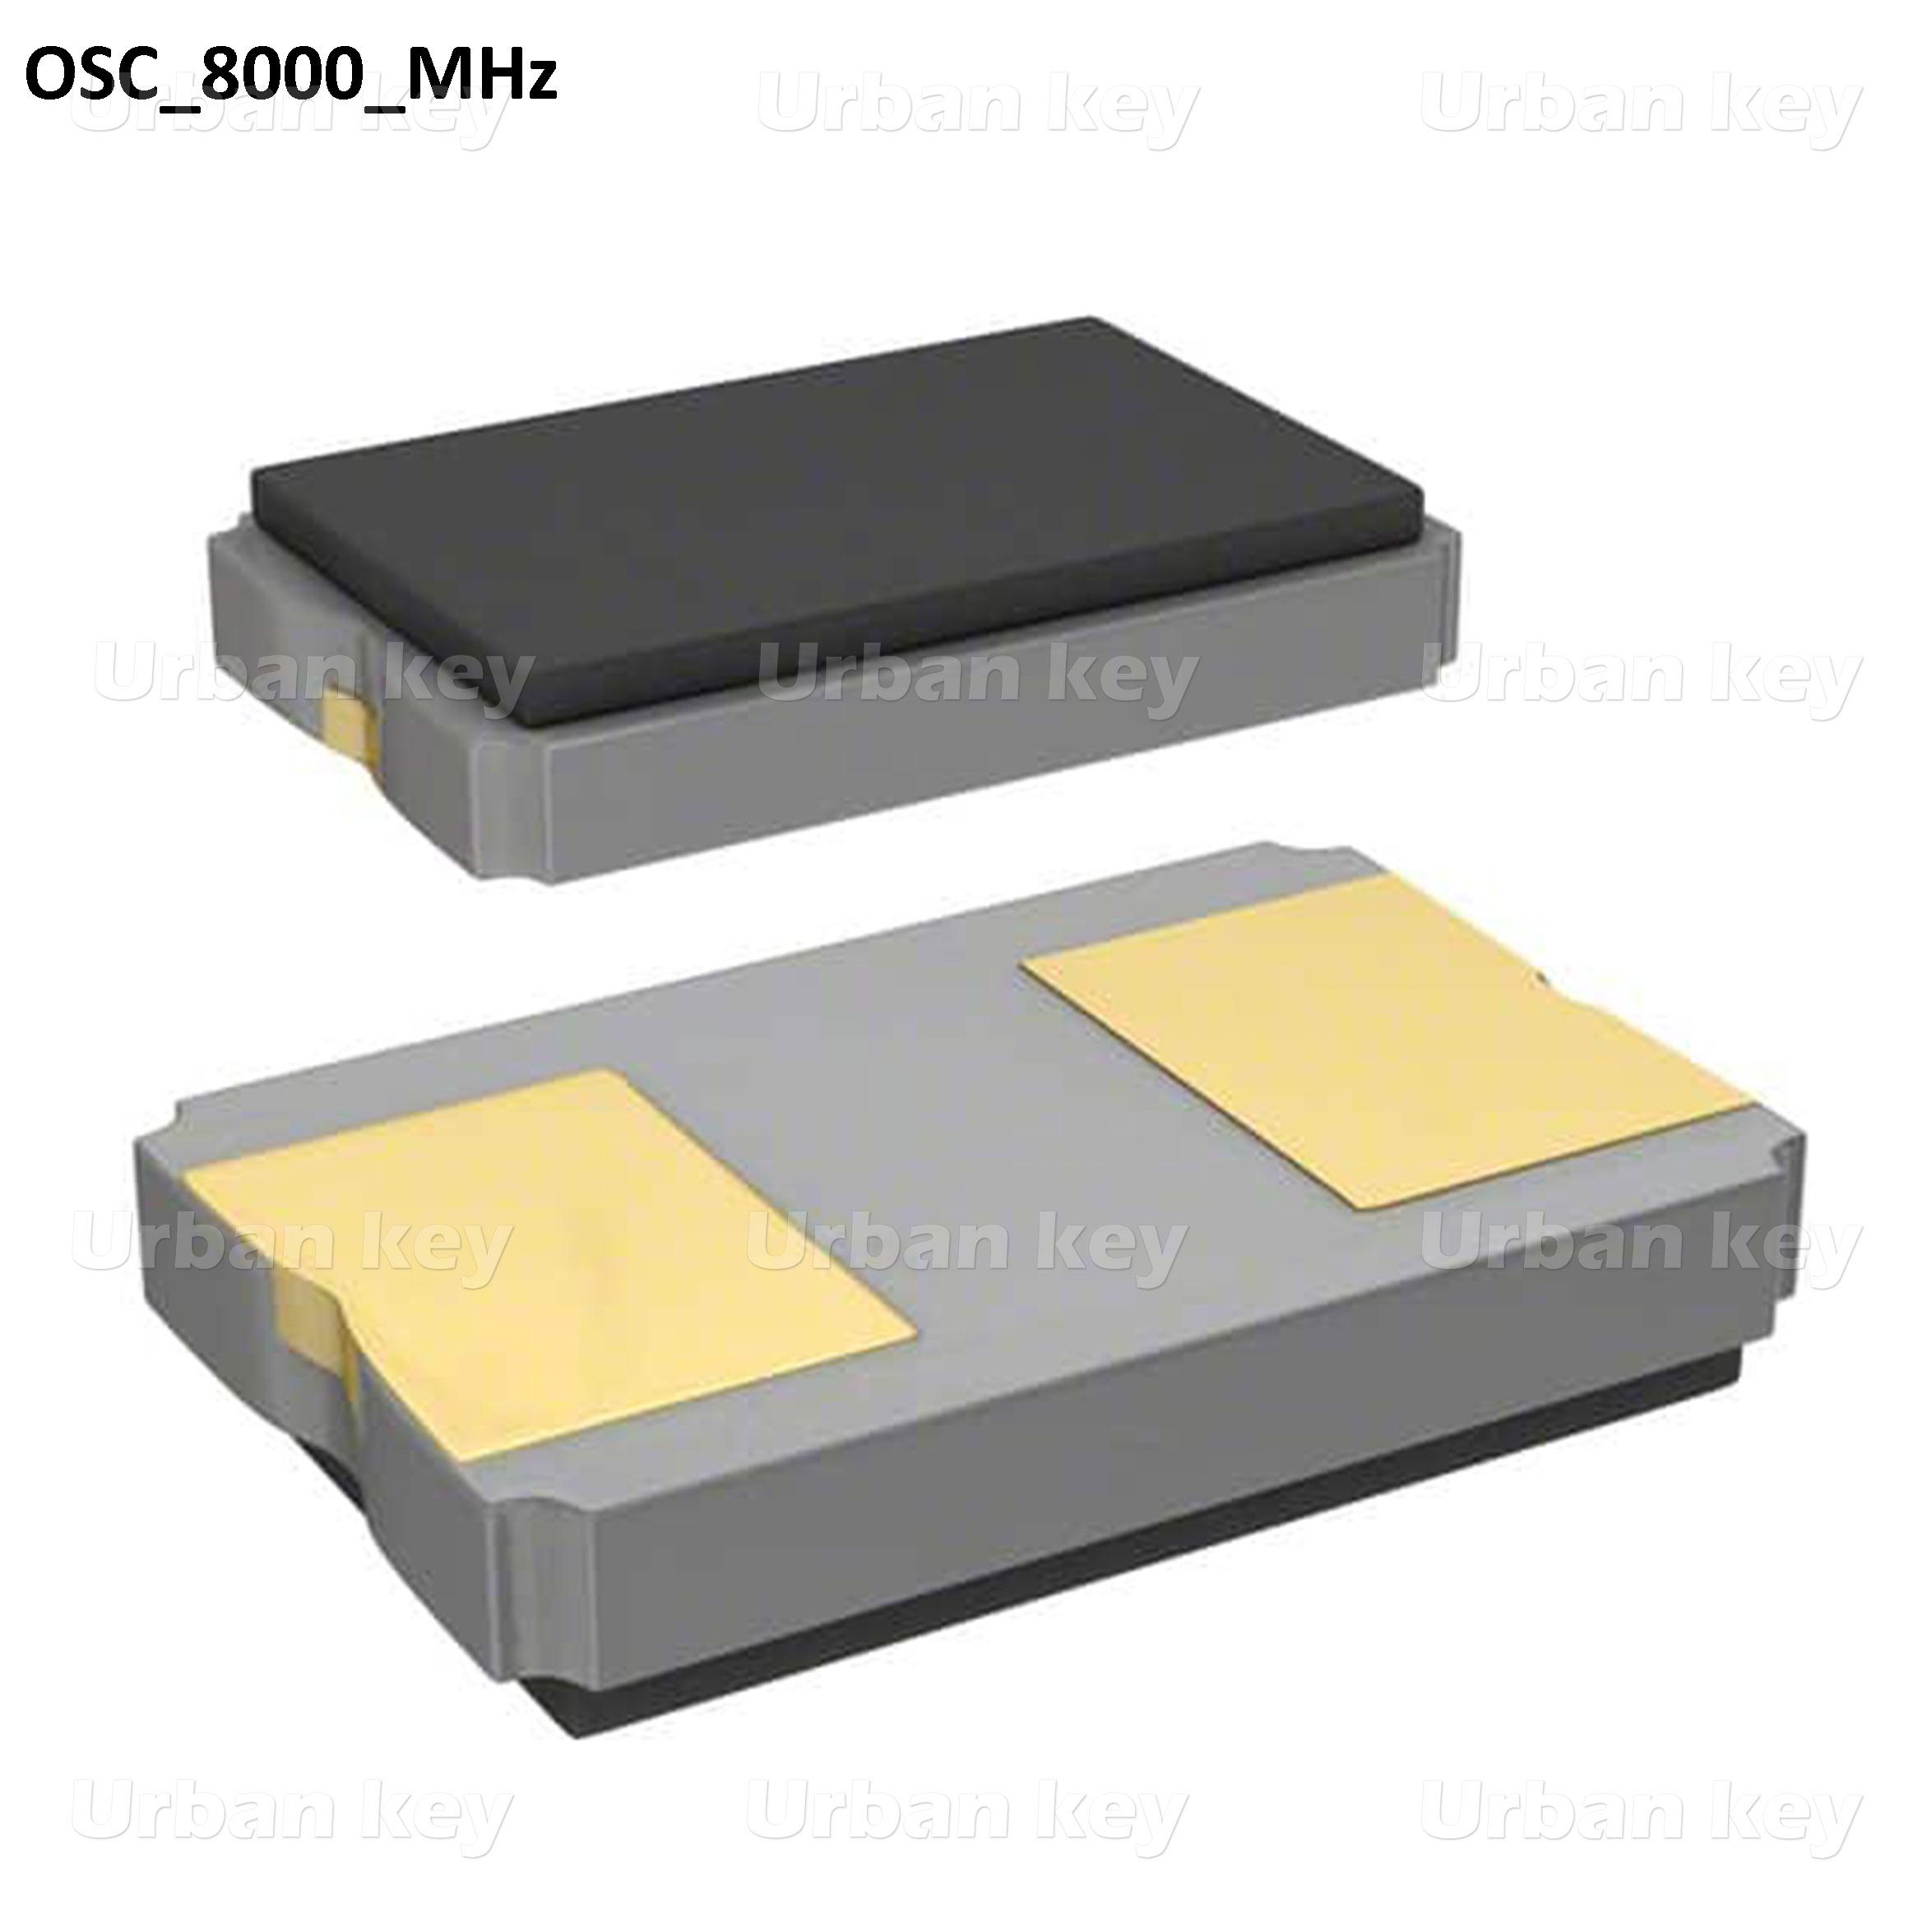 CRYSTAL OSCILADOR_8000_MHz